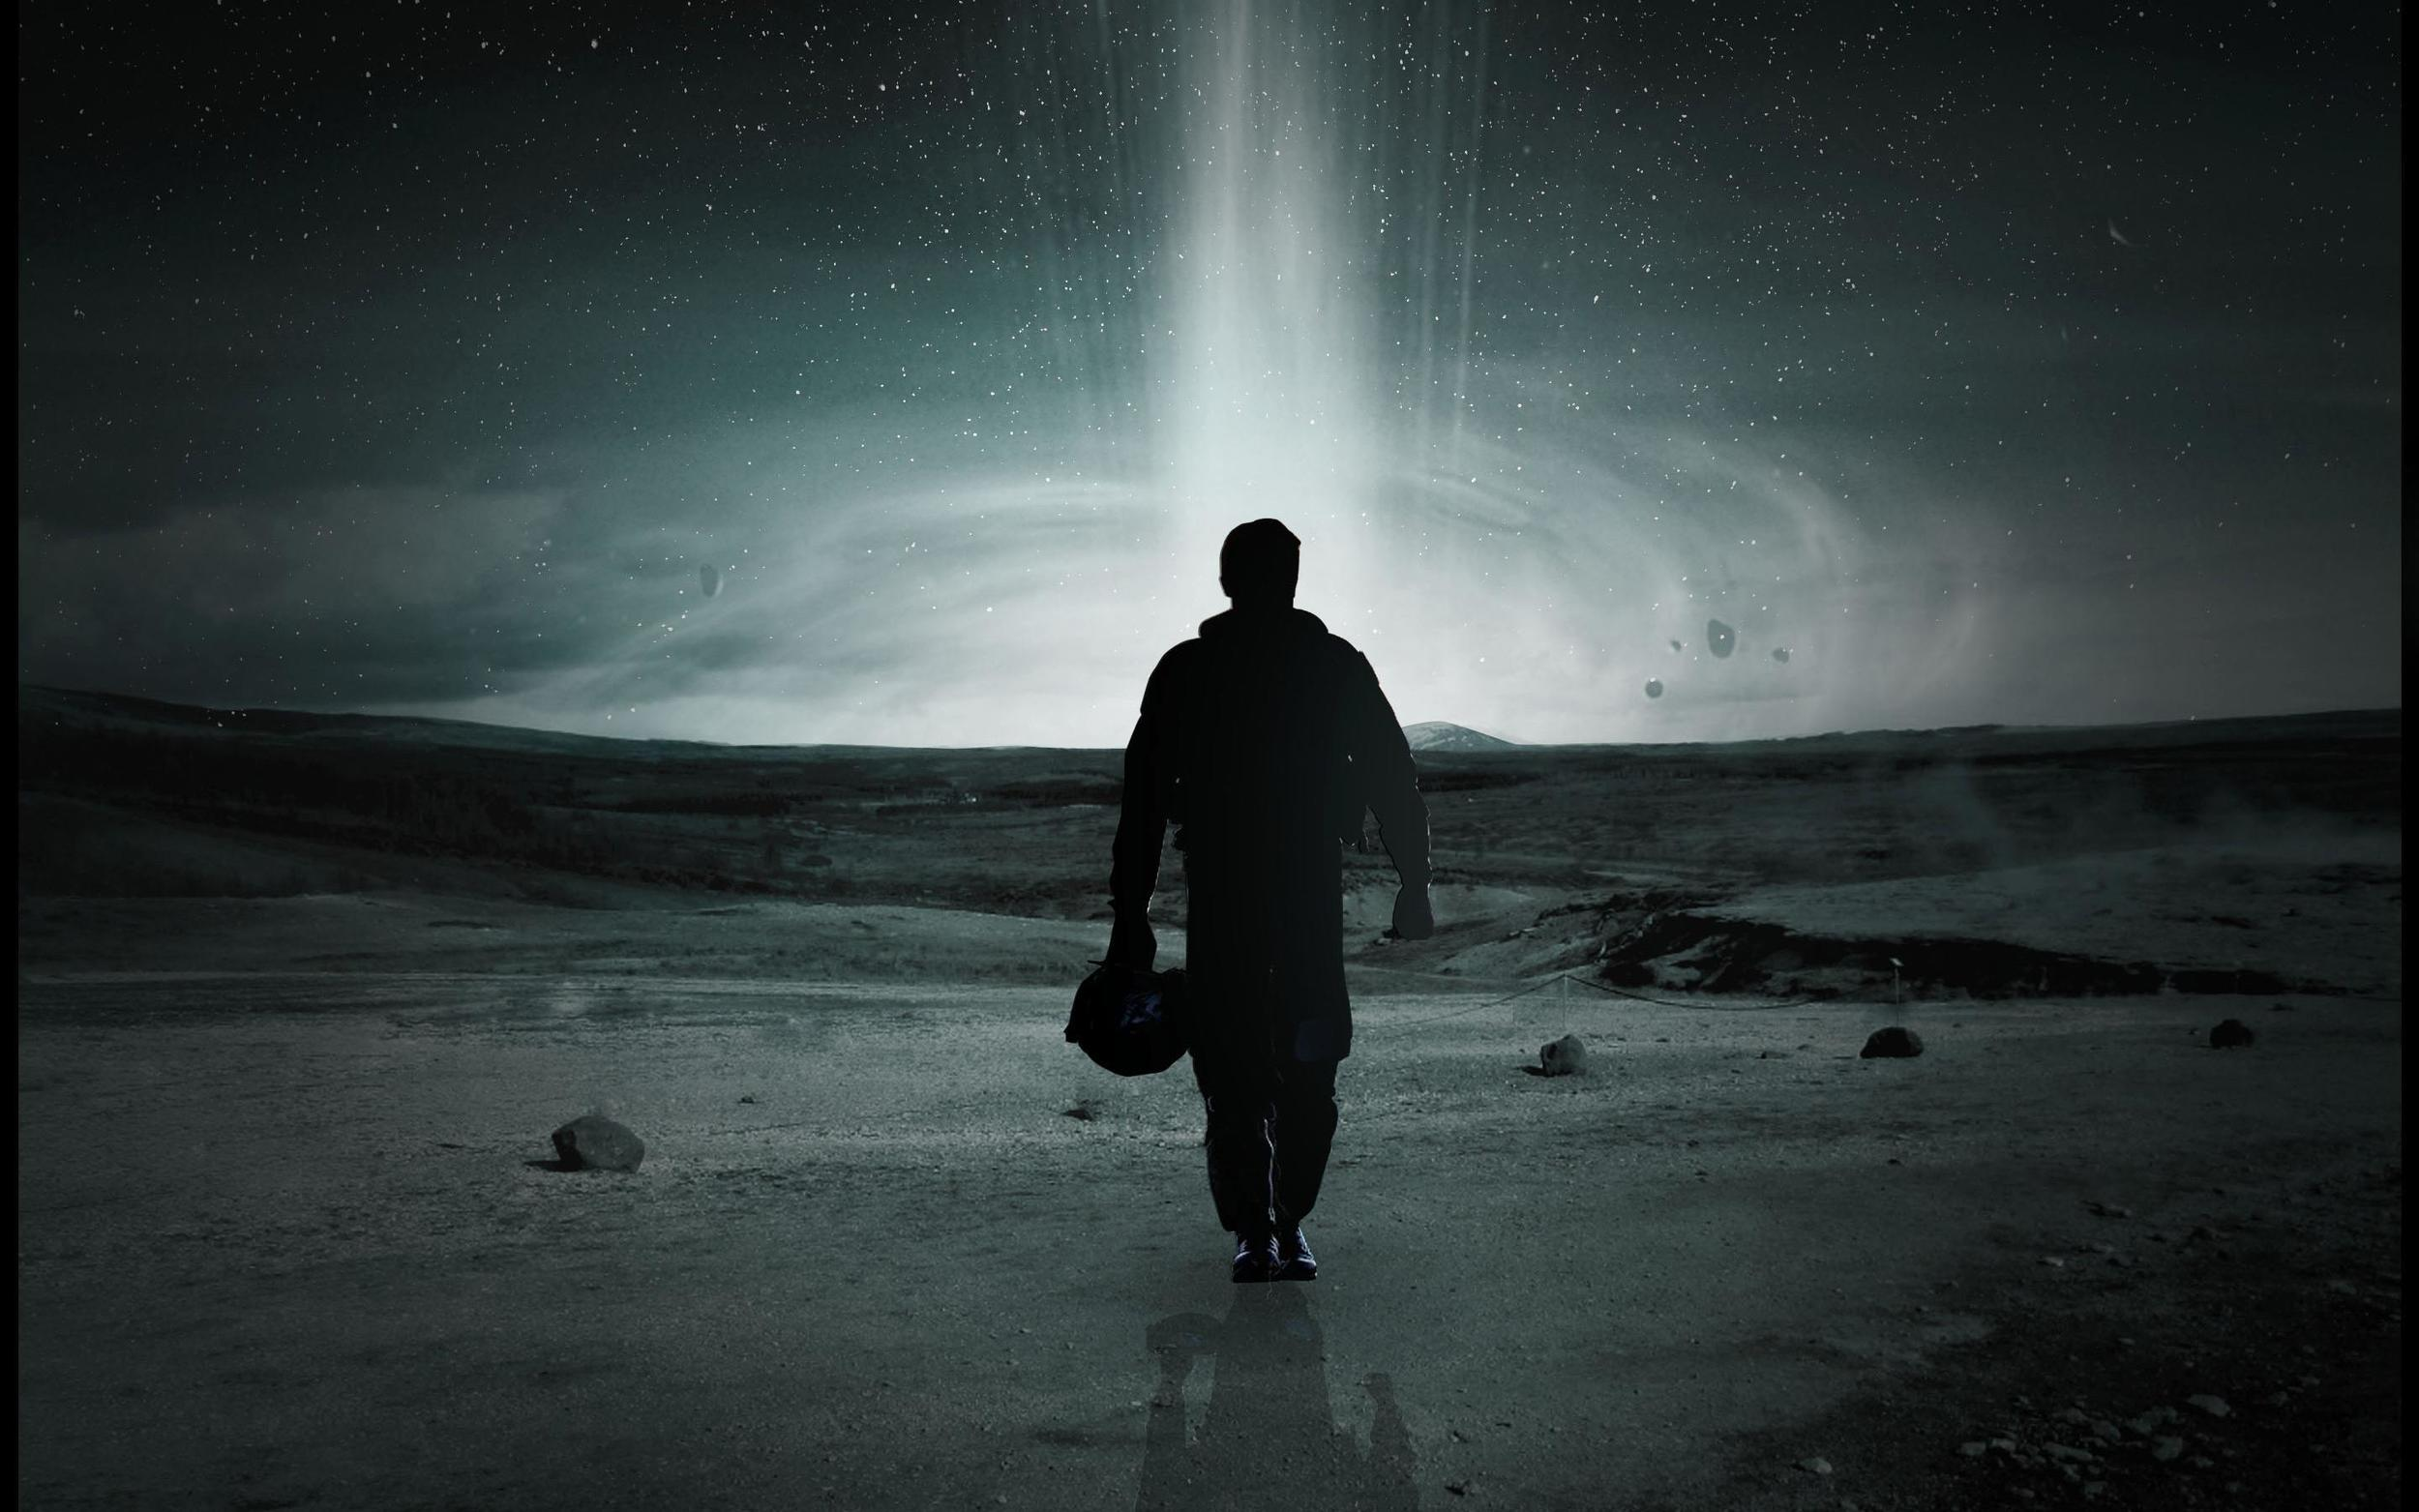 Interstellar_ParamountPictures_Image11.jpg